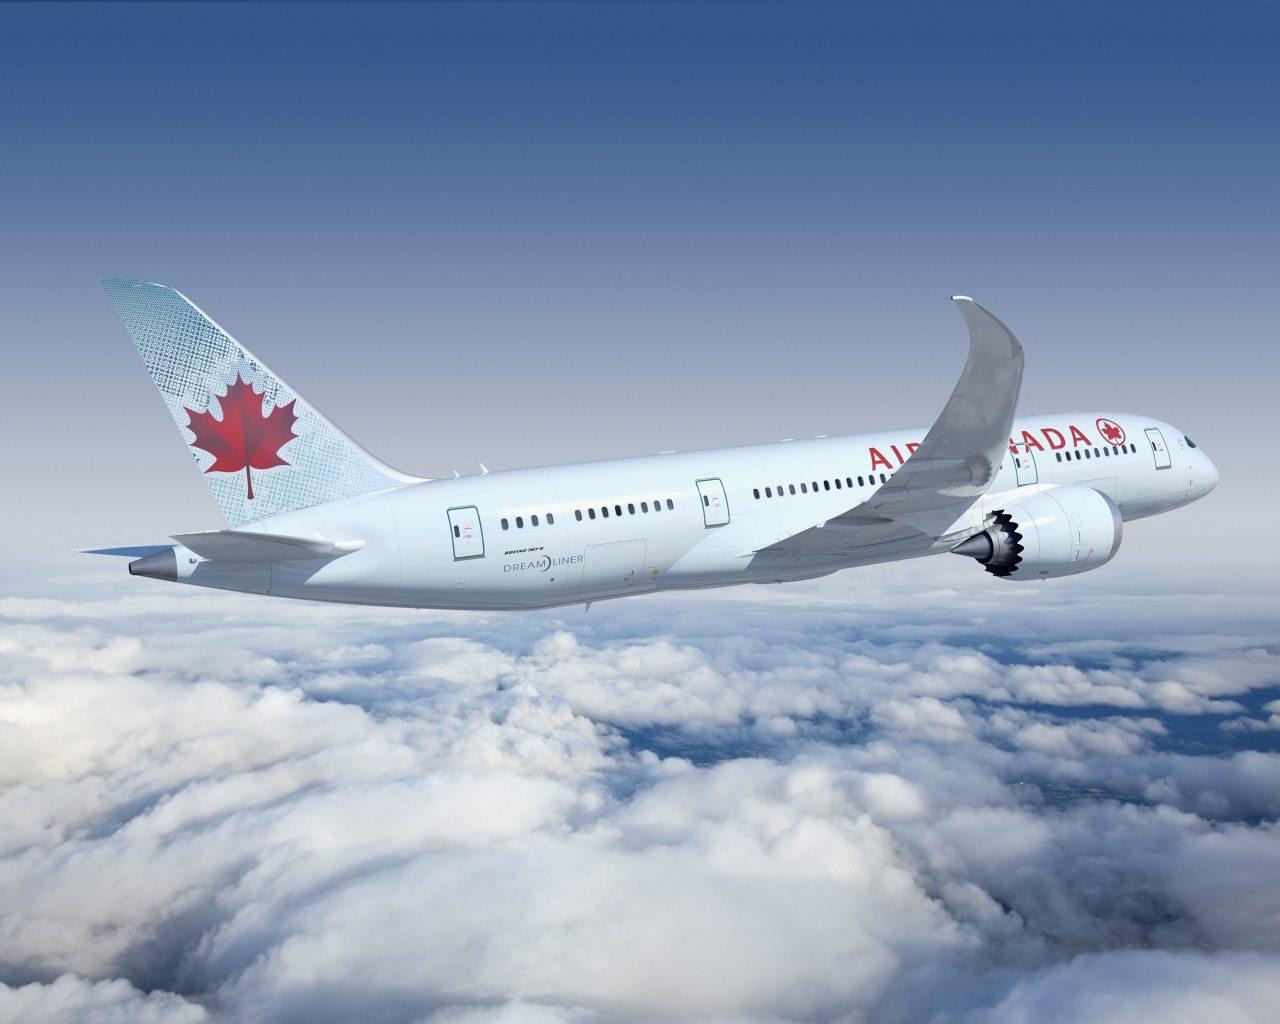 Air Canada reembolsará boletos cancelados a sus clientes tras ayuda gubernamental